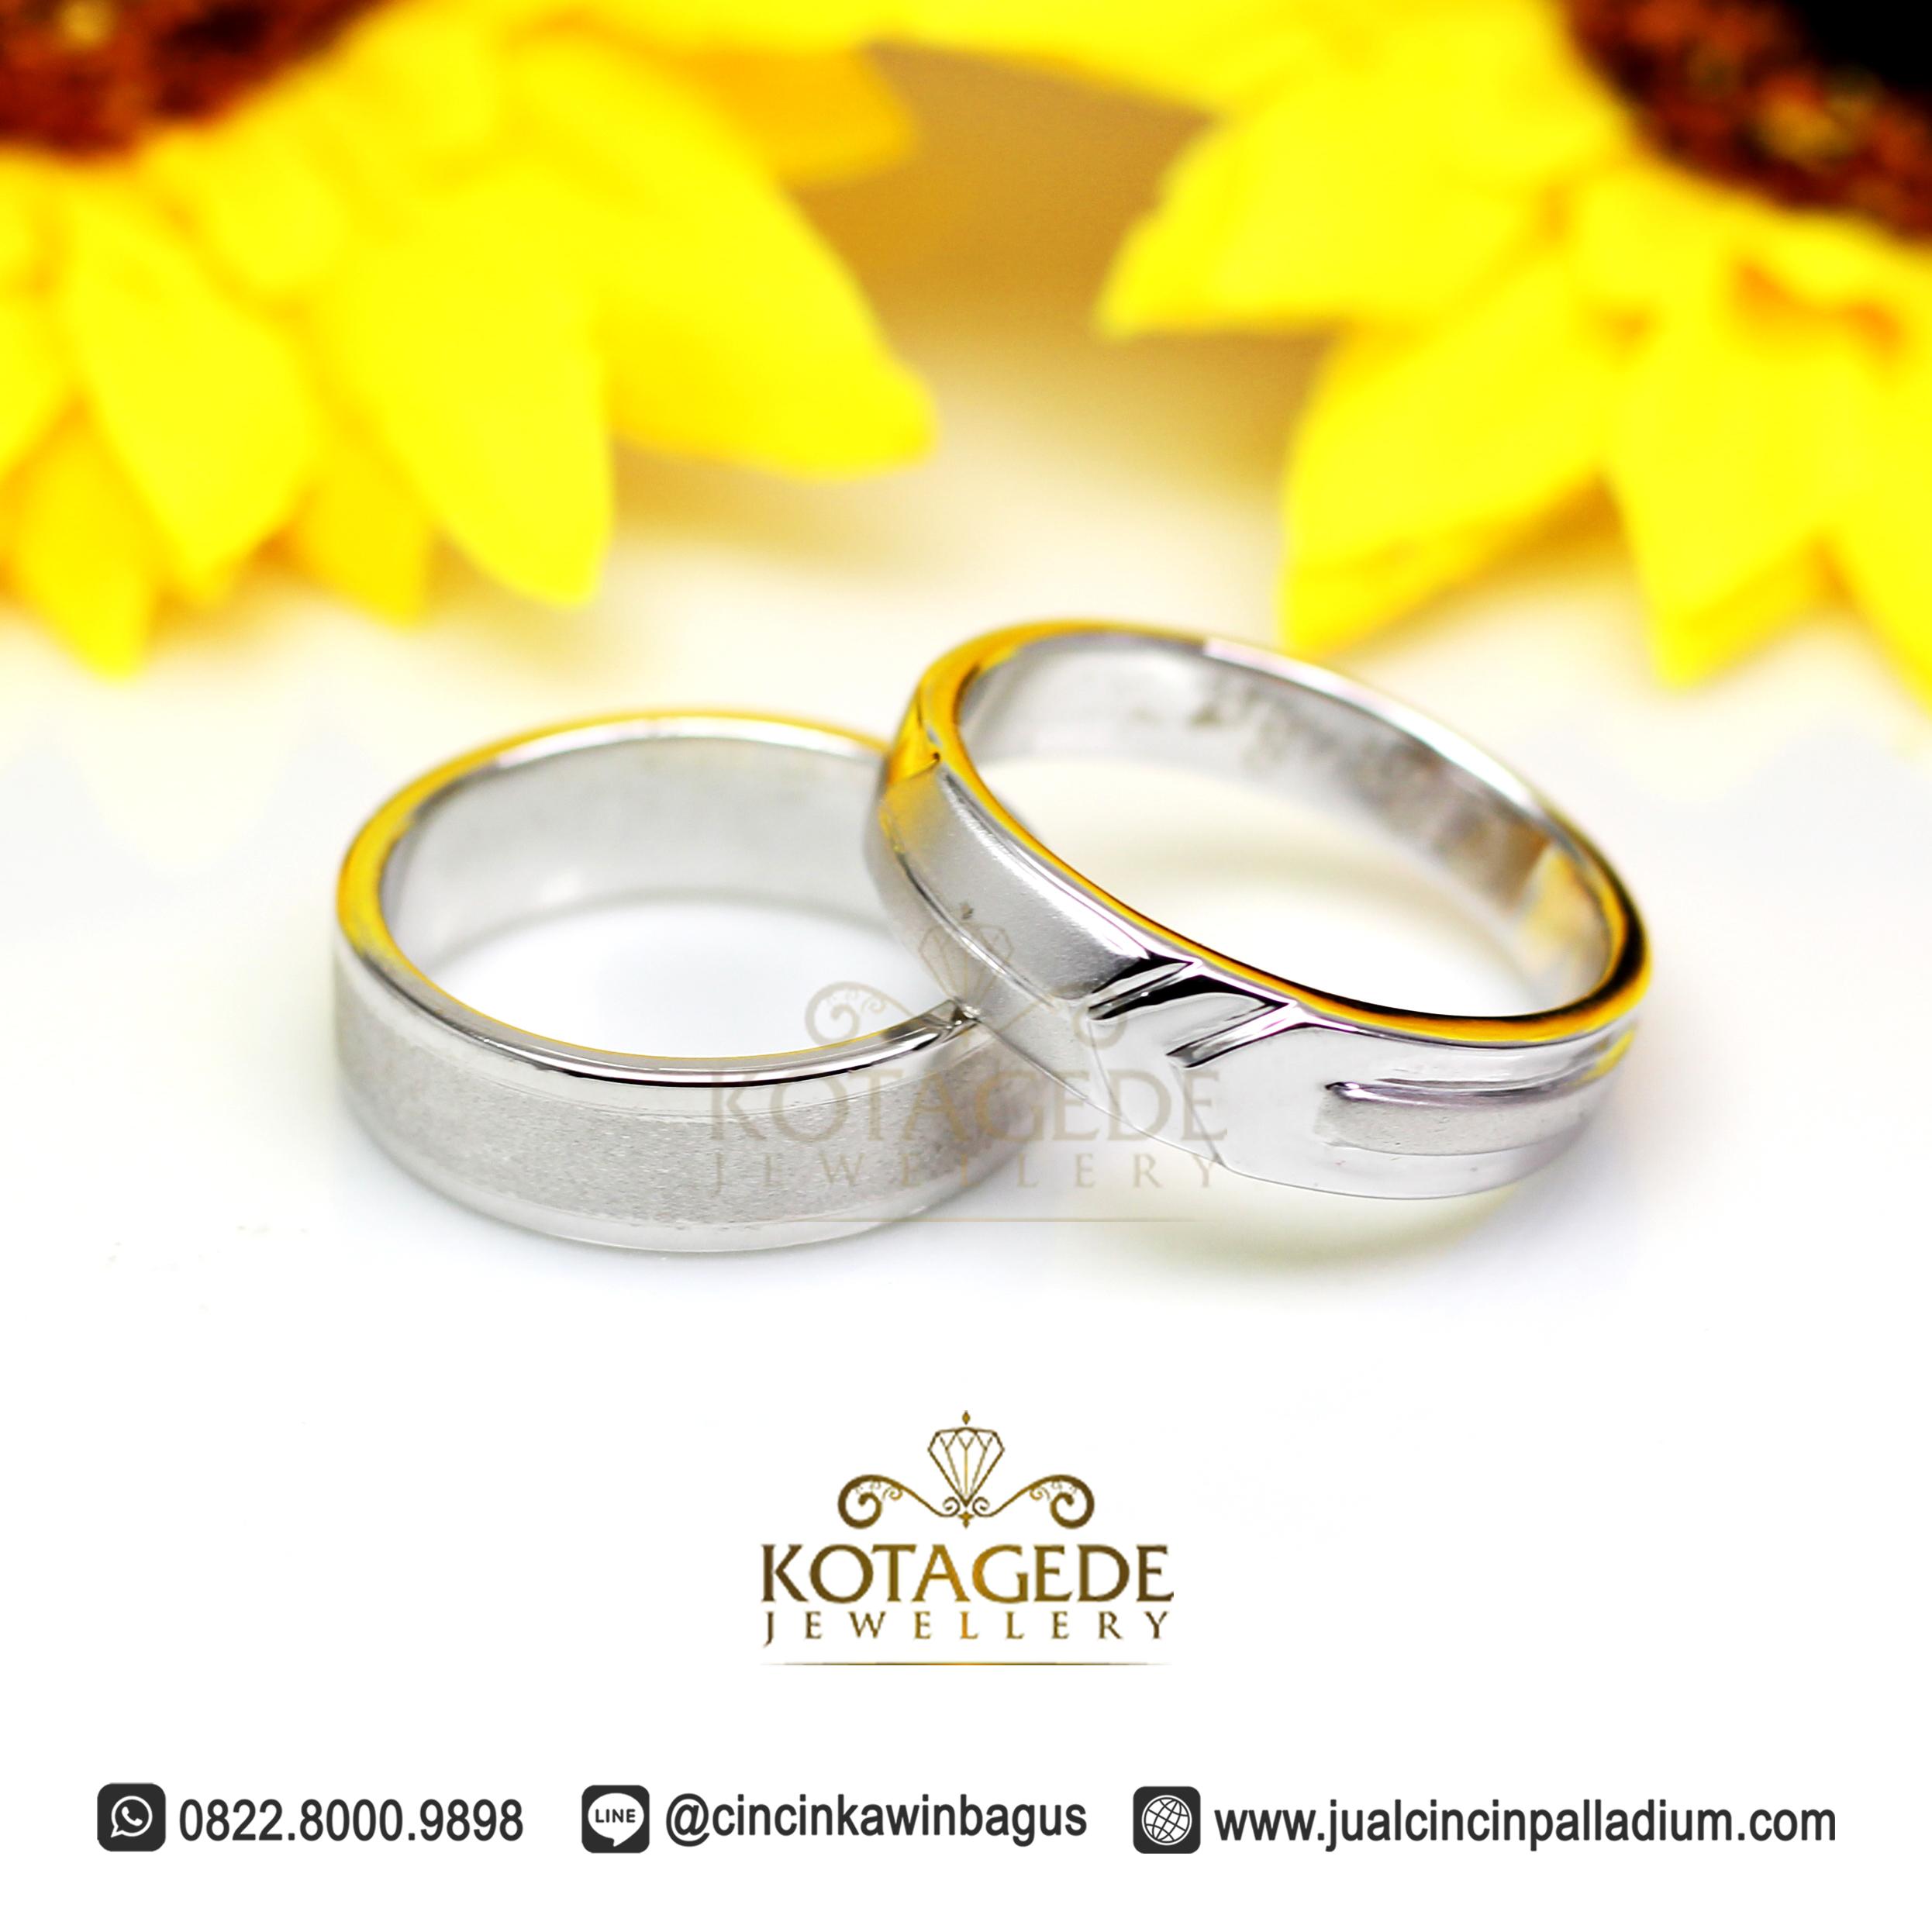 Cincin Kawin Tunangan Model Simpel Dan Elegan Kotagede Jewellery Adalah Solusi Bagi Anda Yang Sedang Mencari Cincin Kawin Cincin Kawin Cincin Cincin Impian